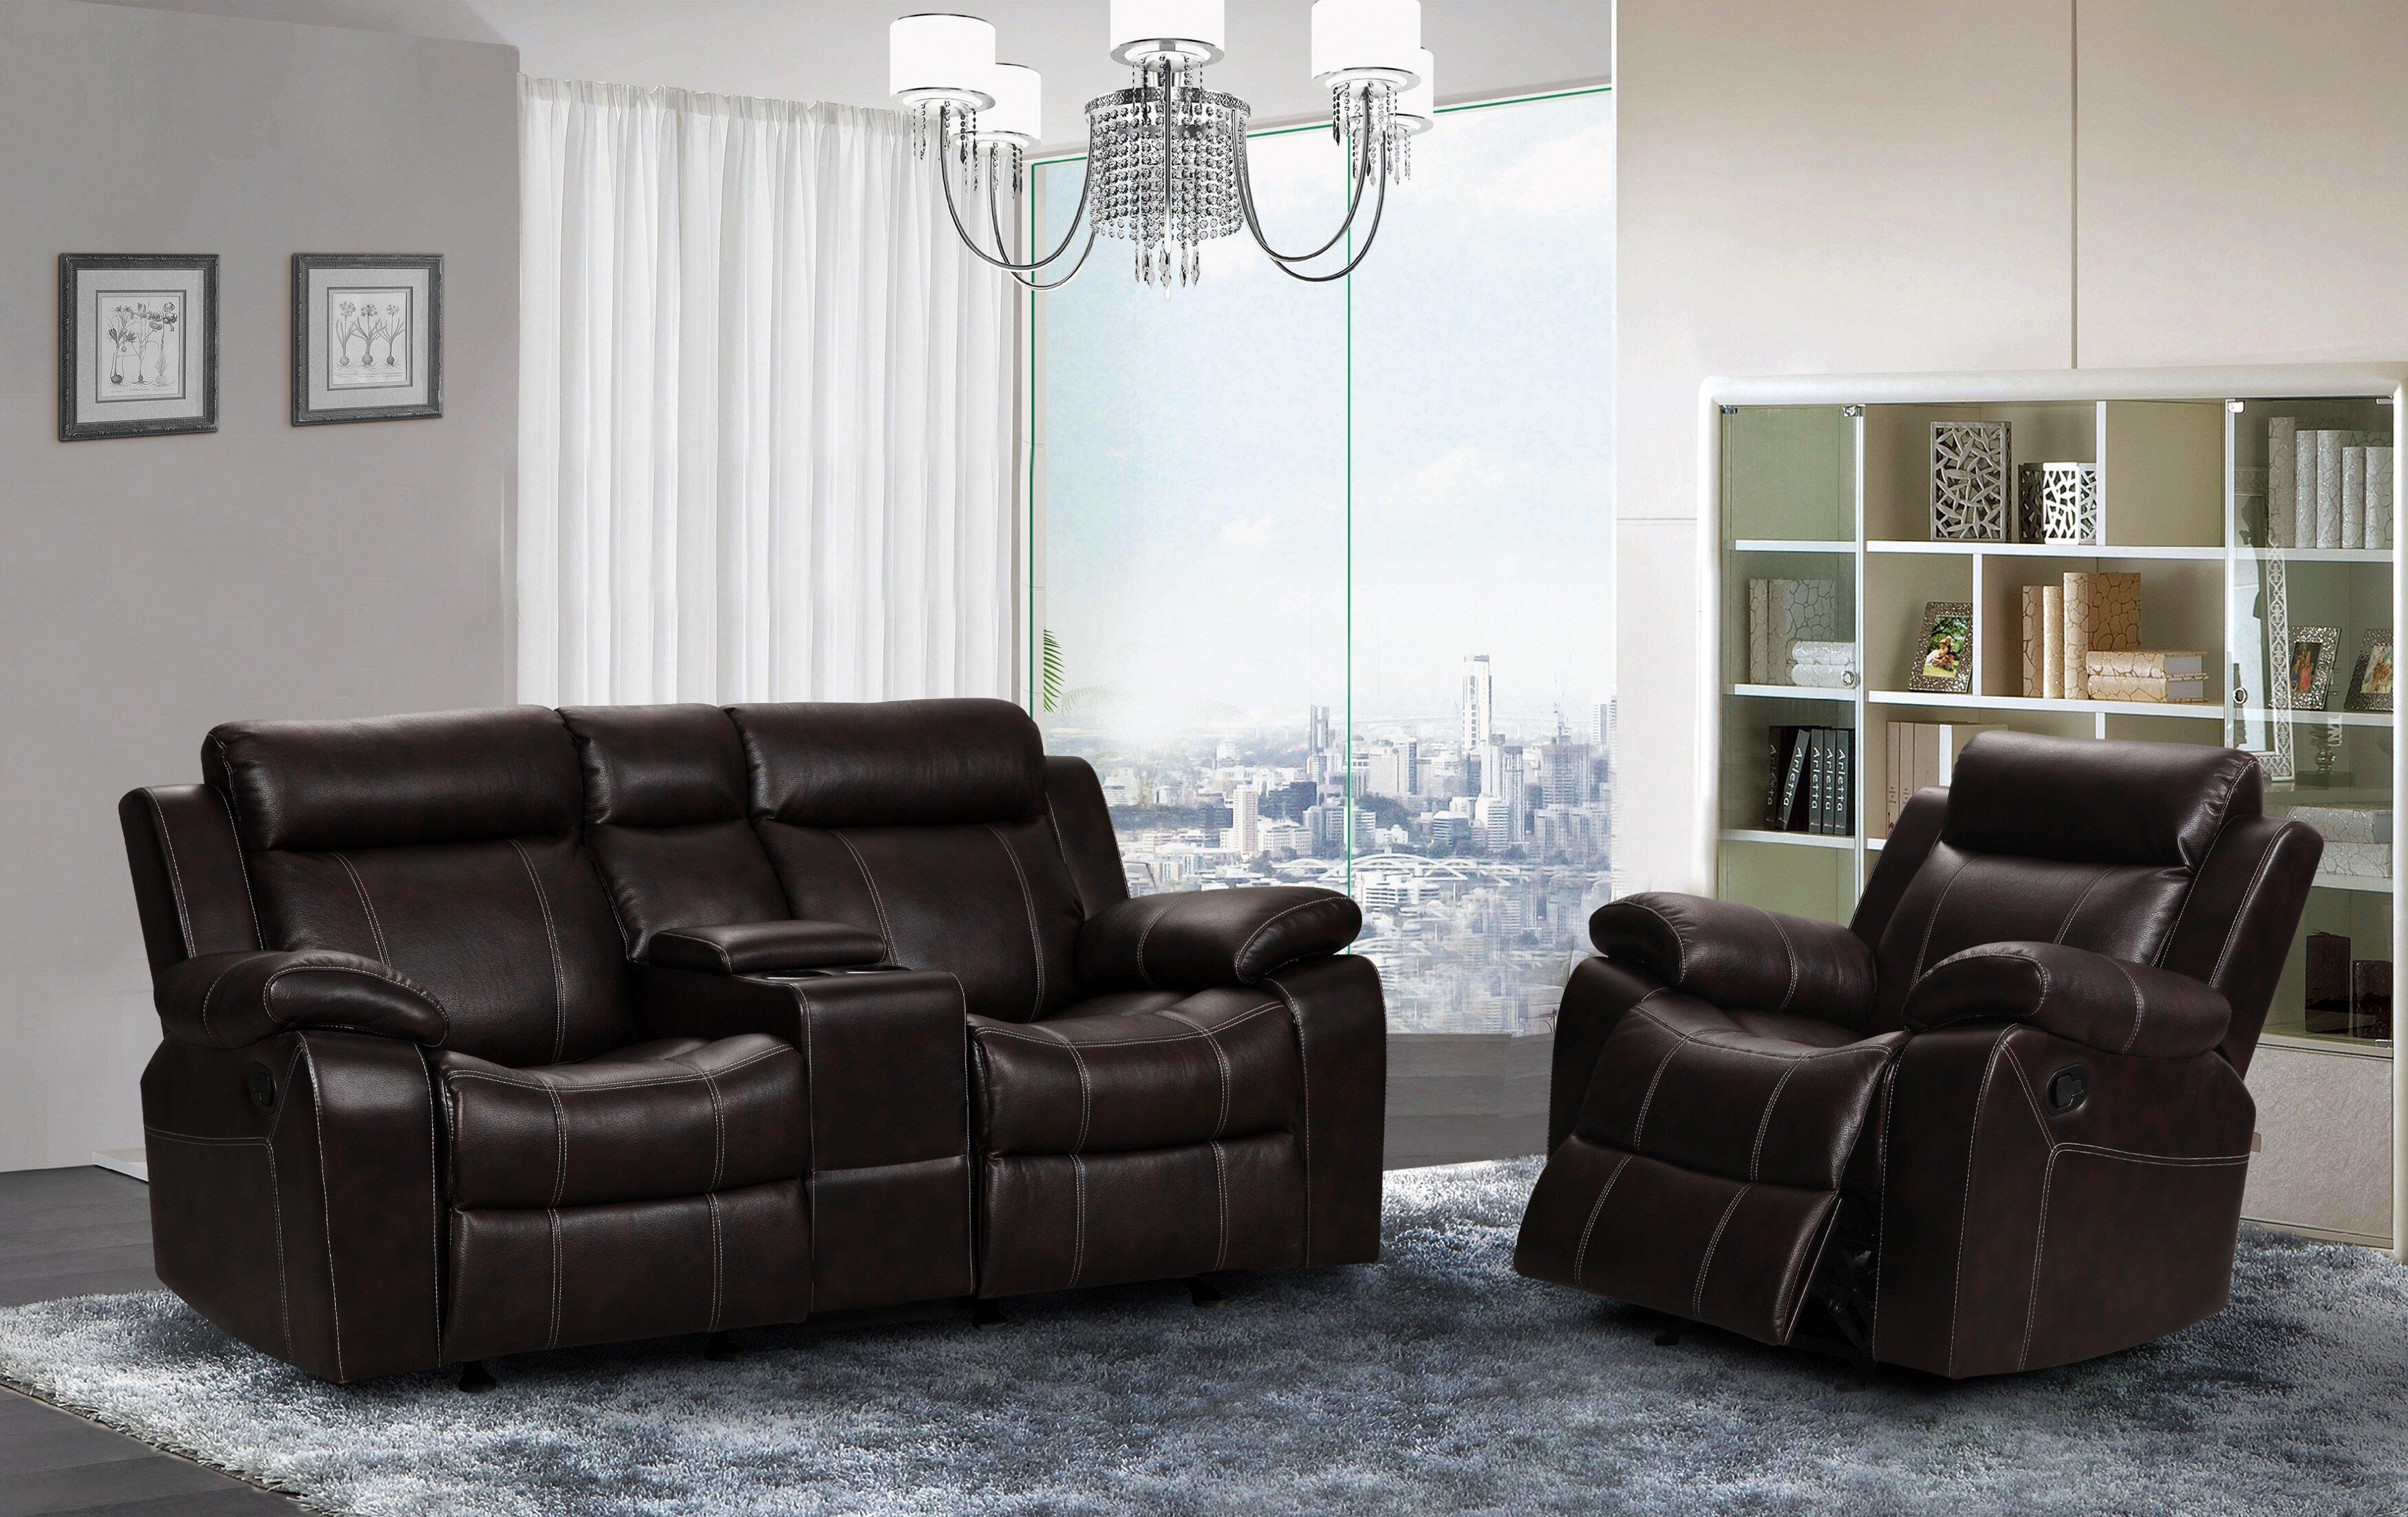 Red Barrel Studio Manan 2 Piece Reclining Living Room Set Wayfair Ca